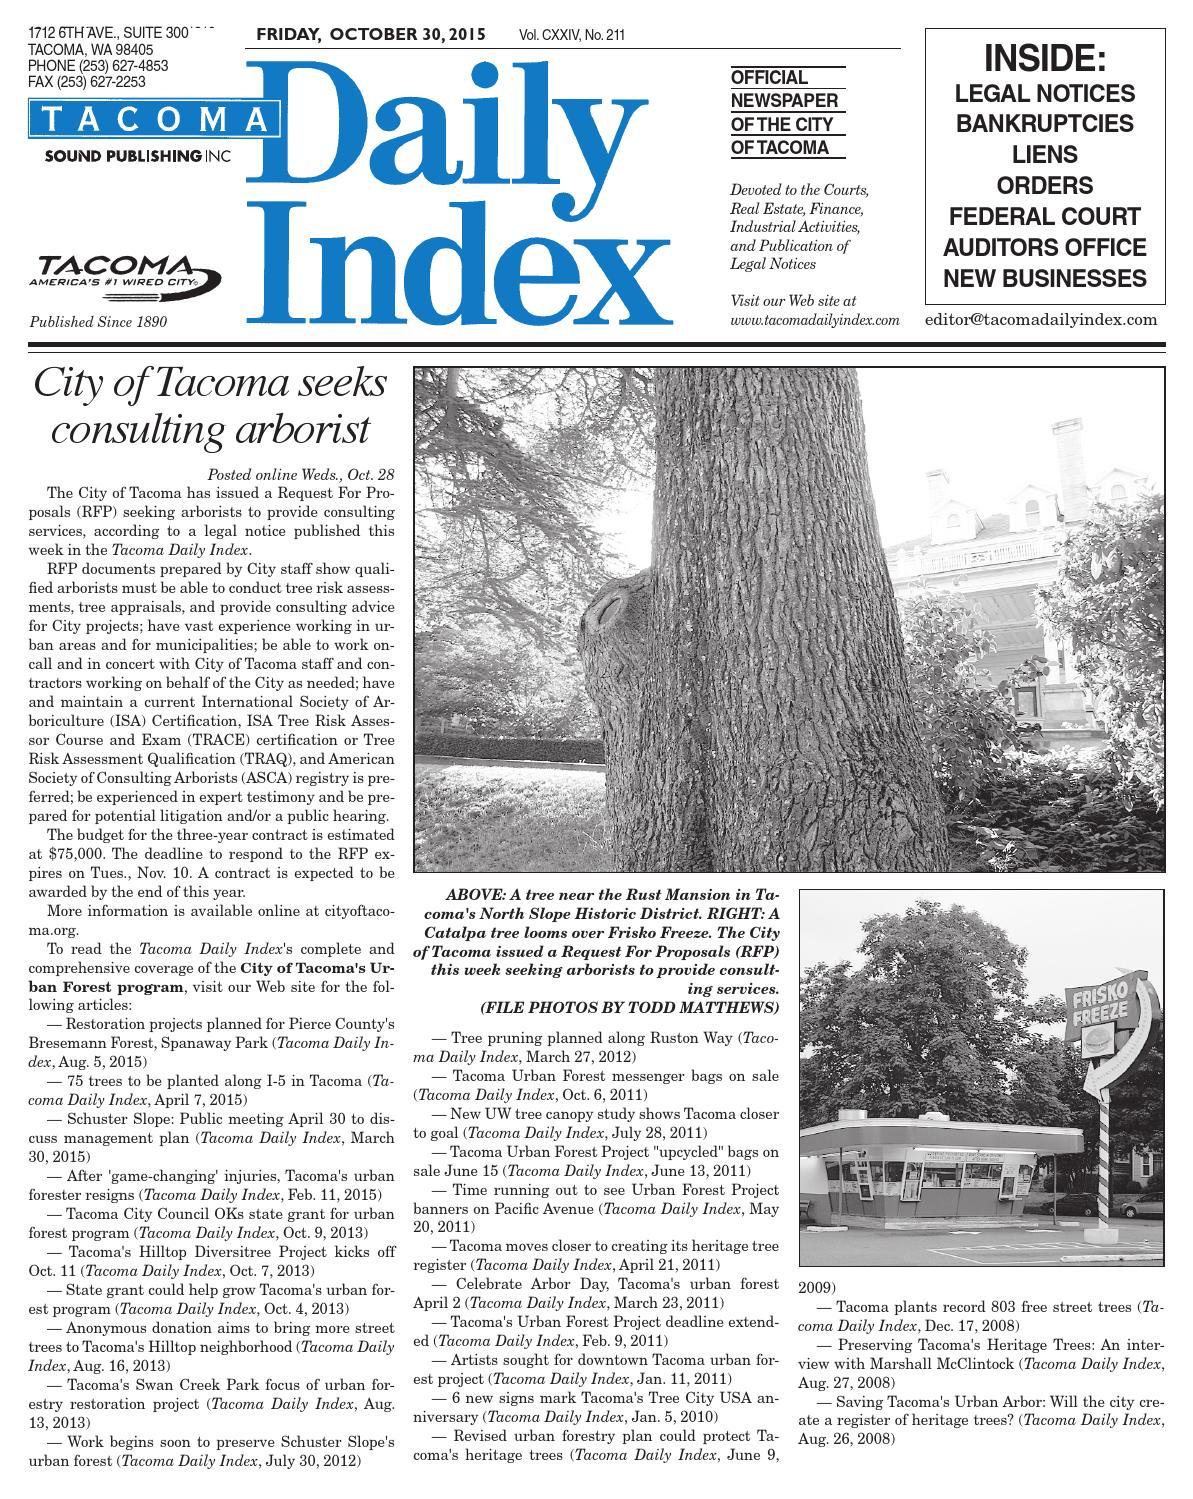 Tacoma Daily Index, October 30, 2015 by Sound Publishing - issuu